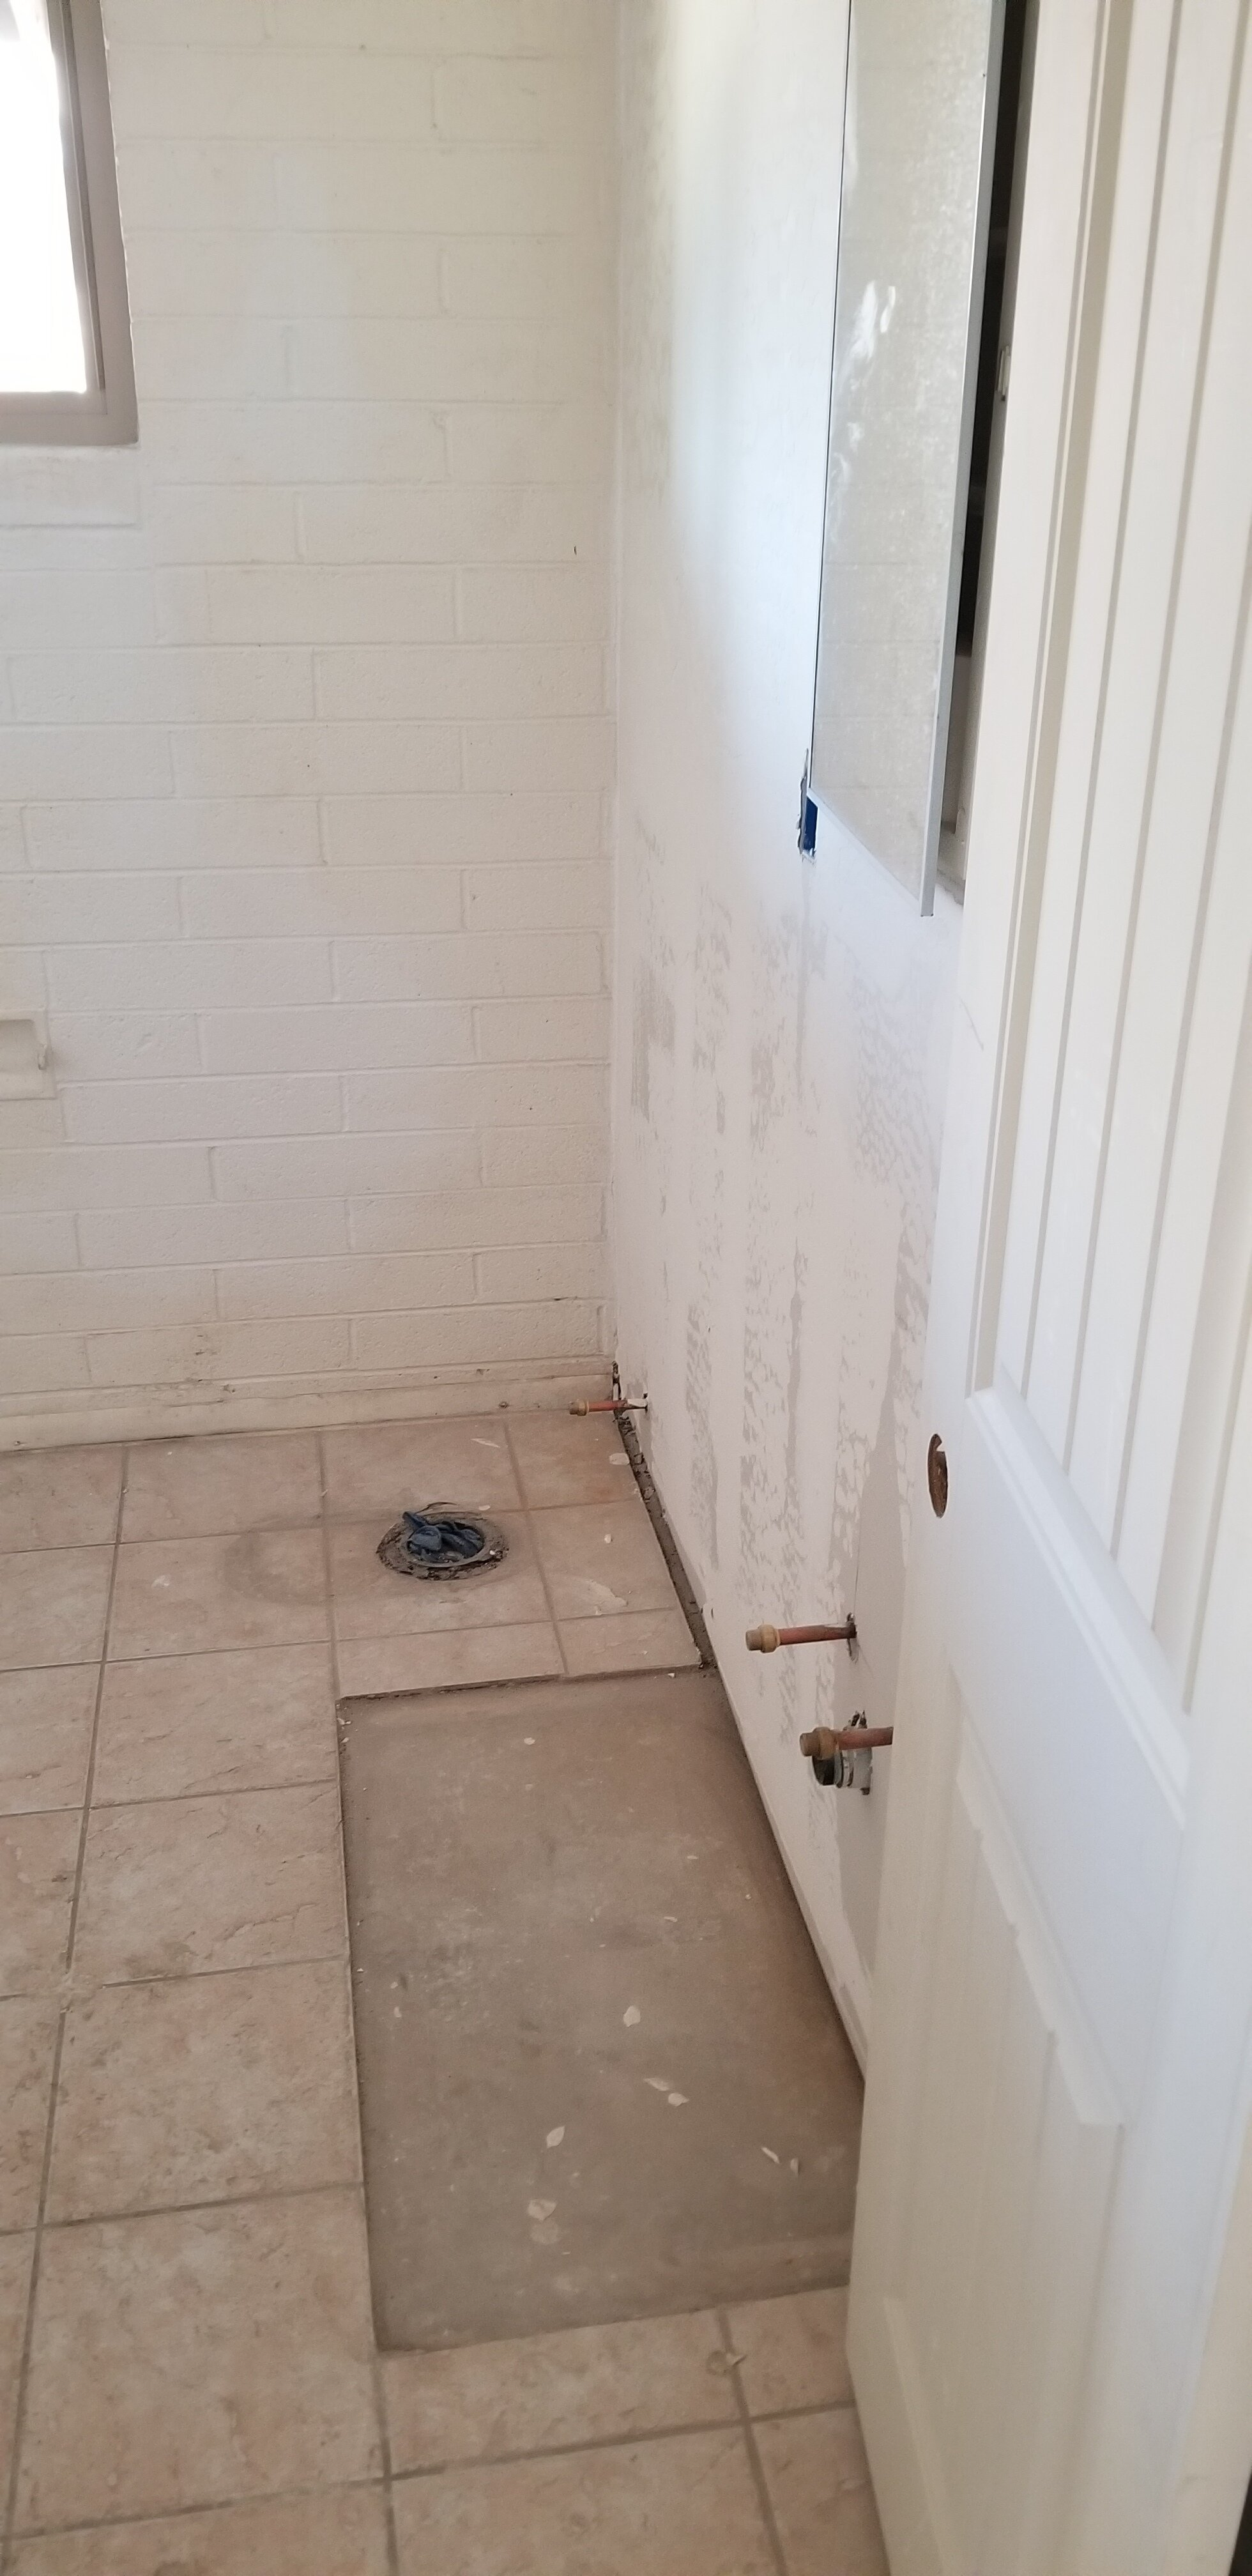 Bathroom walls repaired